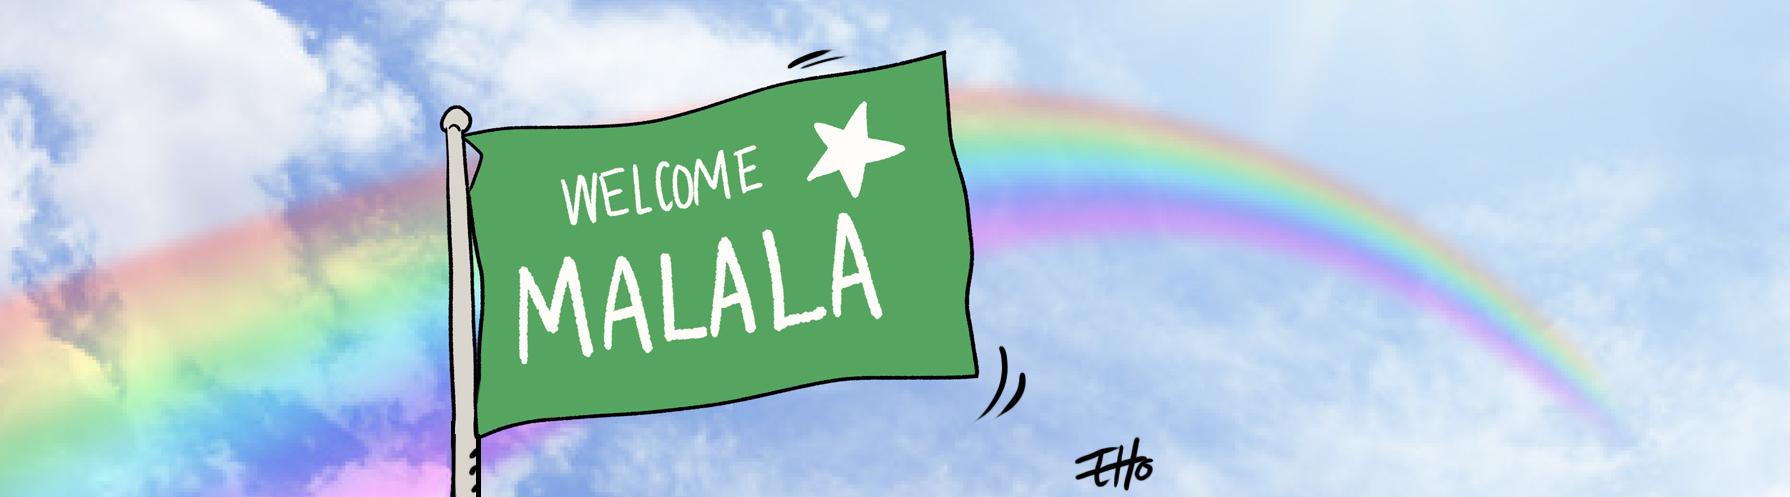 Malala Yousazfai est retournée au Pakistan